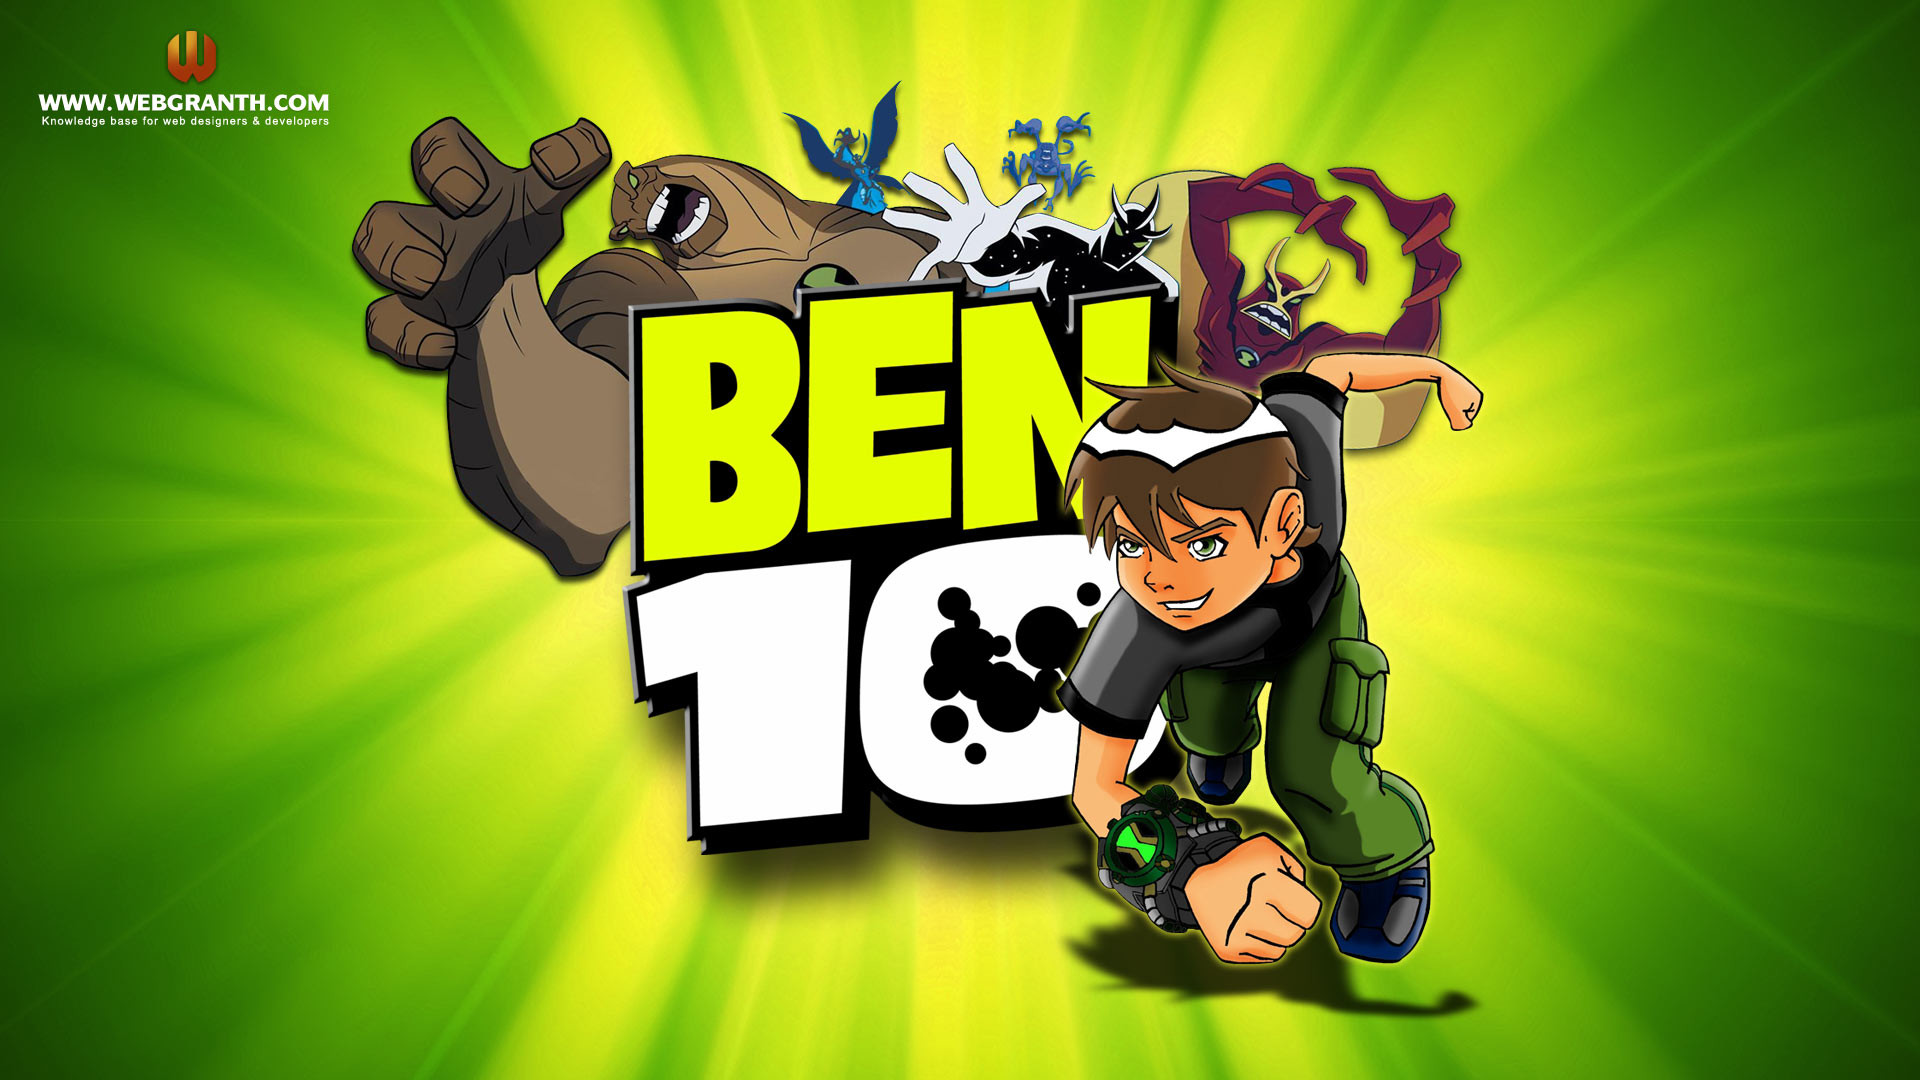 bet 10 cartoon character wallpaper (4)